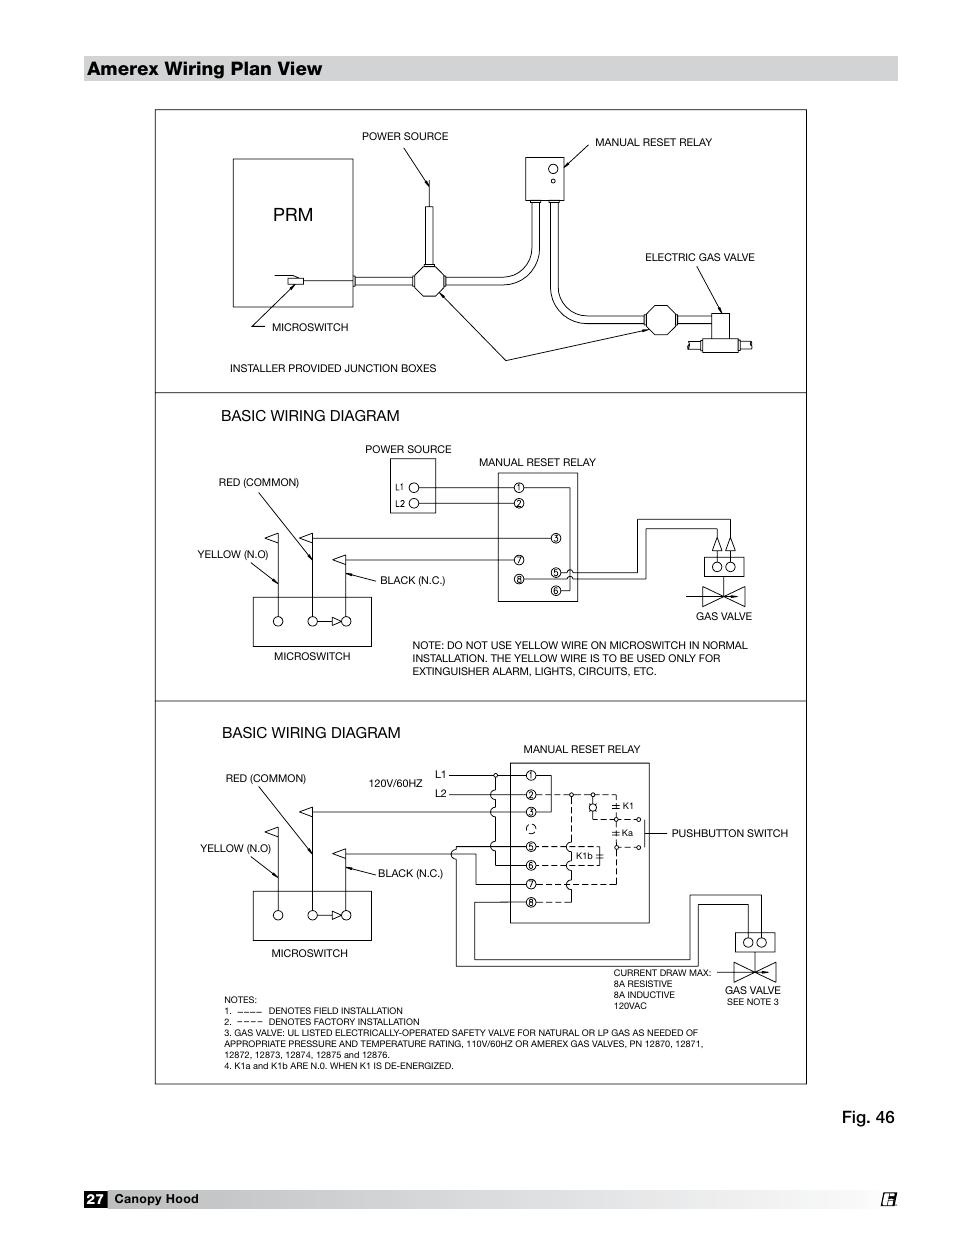 Amerex wiring plan view, Fig. 46, Basic wiring diagram | Greenheck Fan  452413 User Manual | Page 27 / 40Manuals Directory